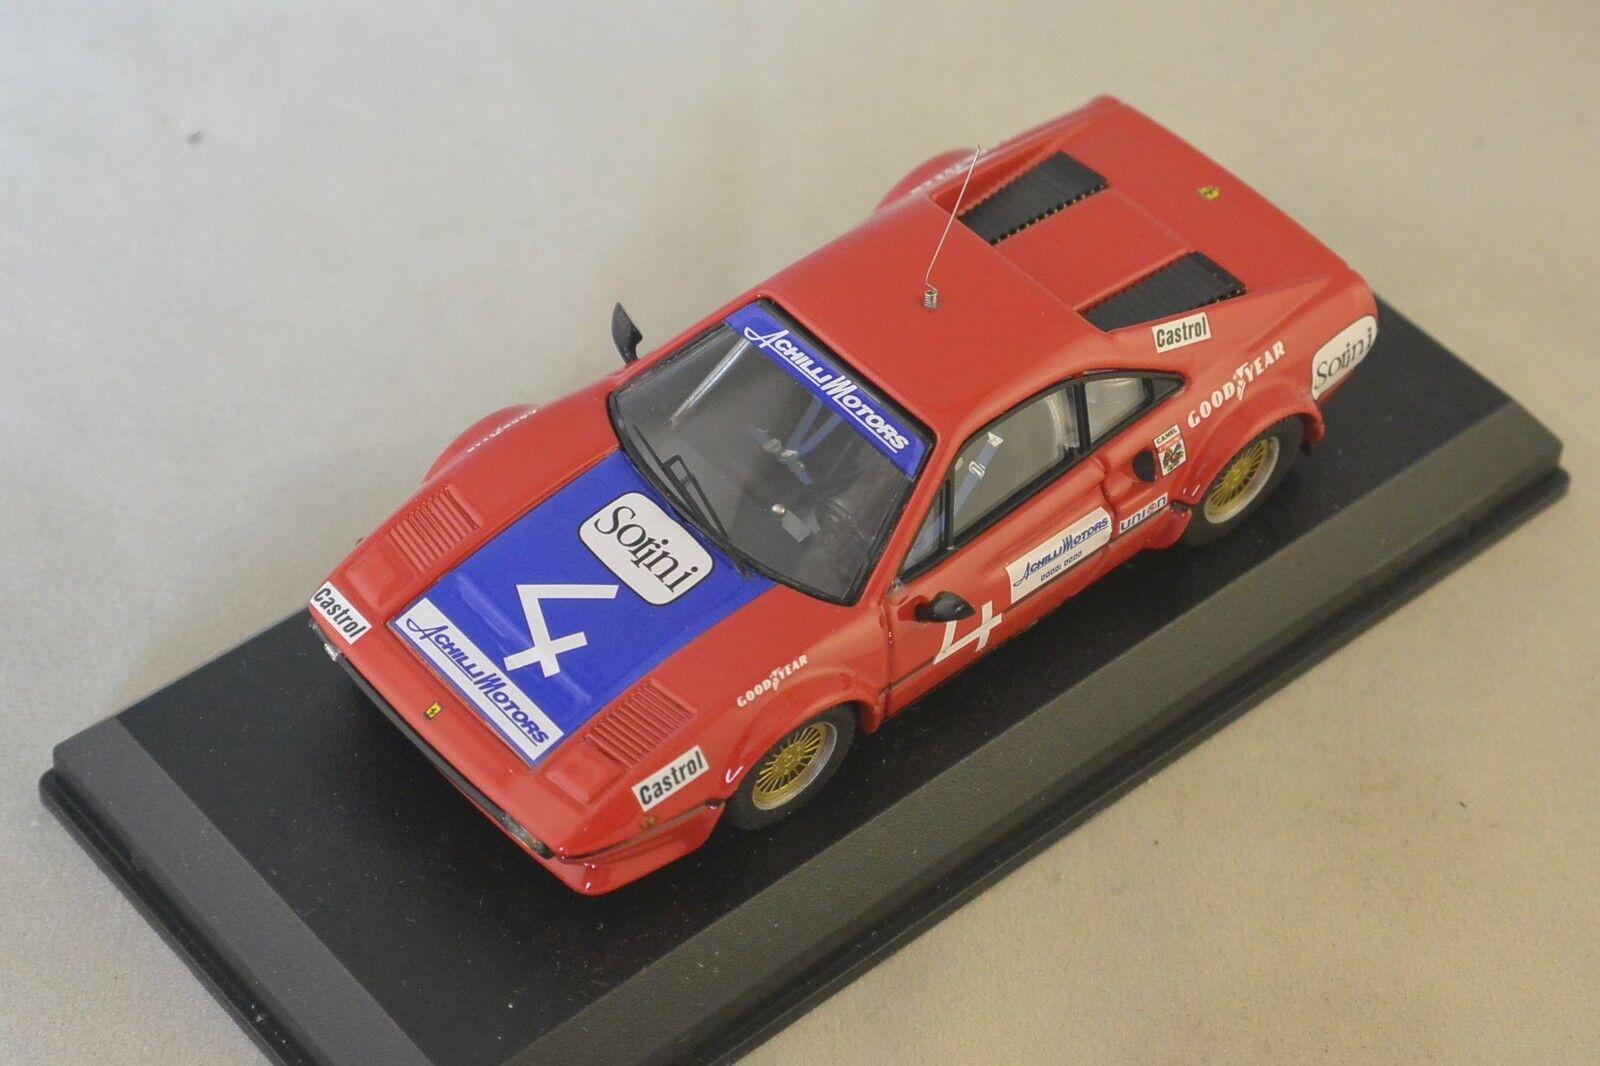 Best Best Best MODEL 9543 - Ferrari 308 GTB coupé Daytona - 1978 Bondurant 1 43 7164e3